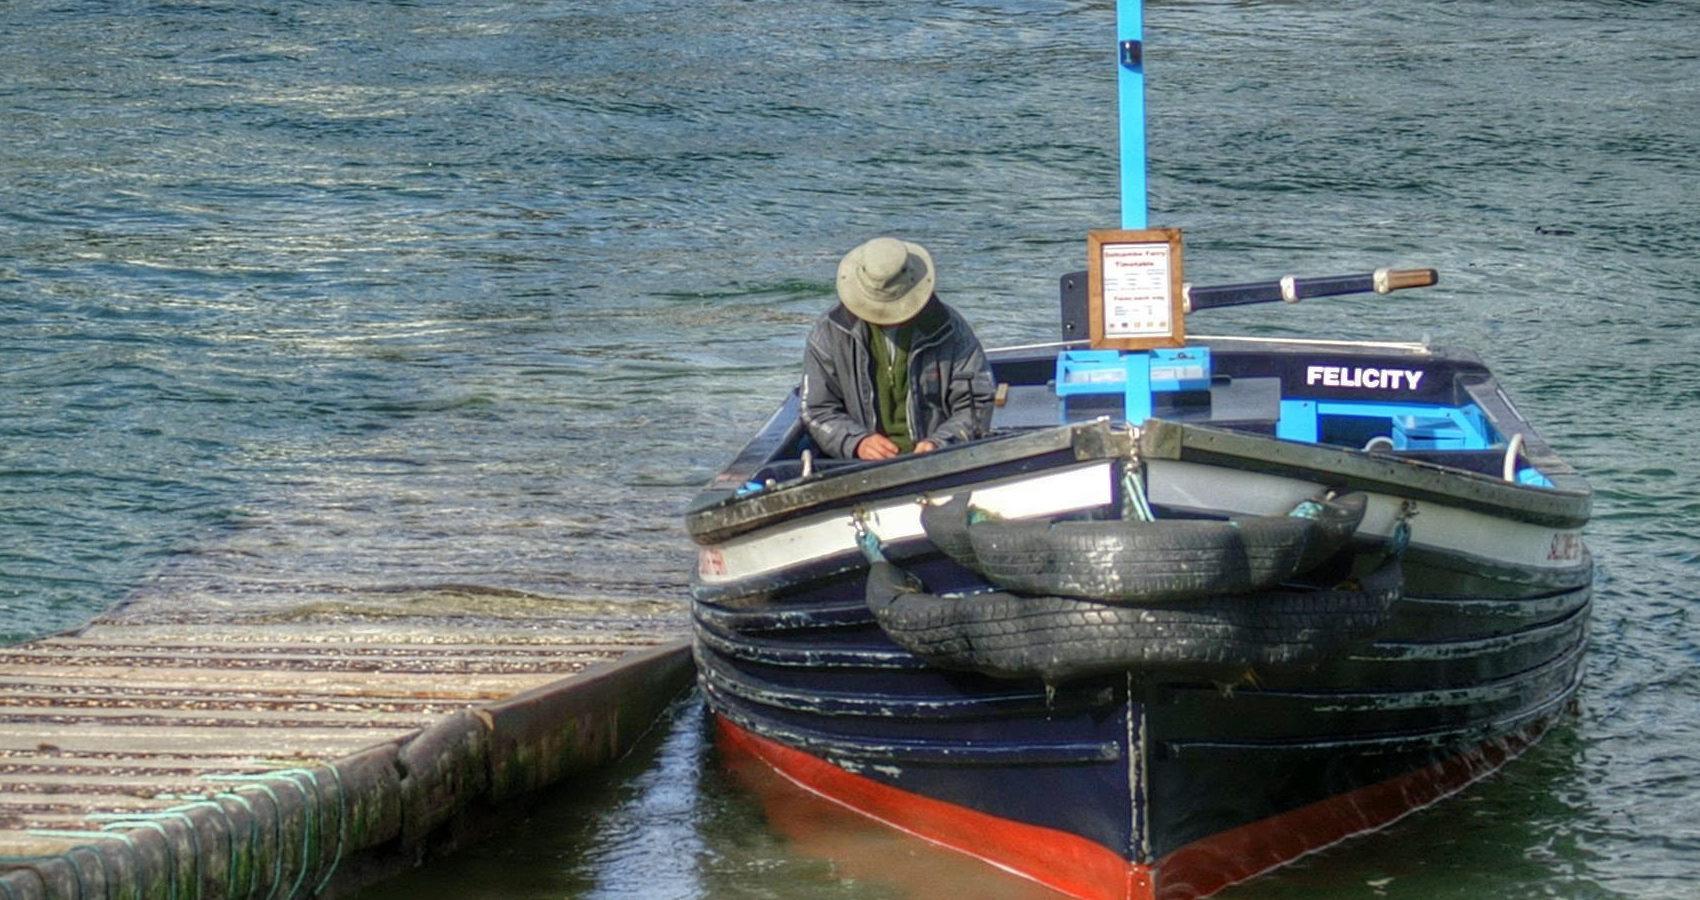 Portlemouth Ferry in Salcombe